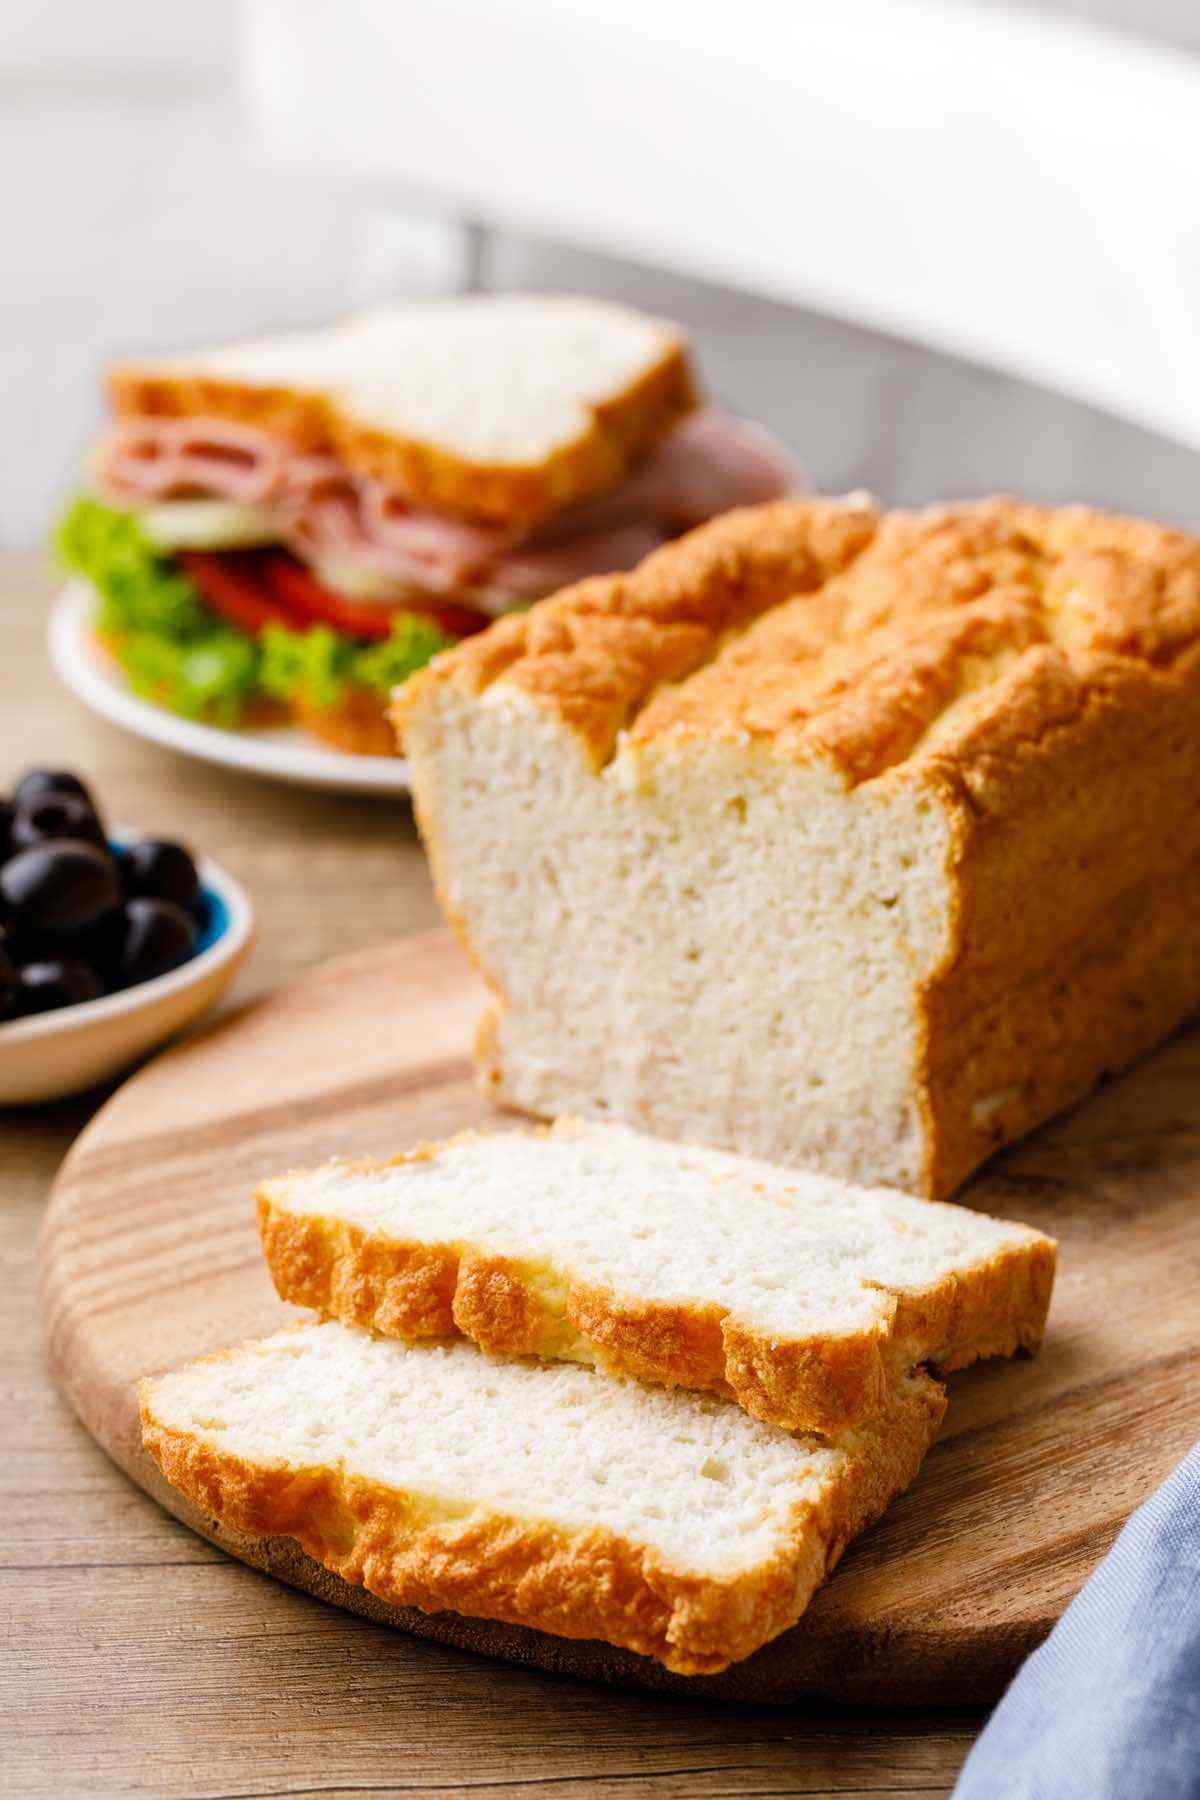 Paleo Low Carb Bread  Chewy Paleo Sandwich Bread Best Easy Paleo Bread Recipe